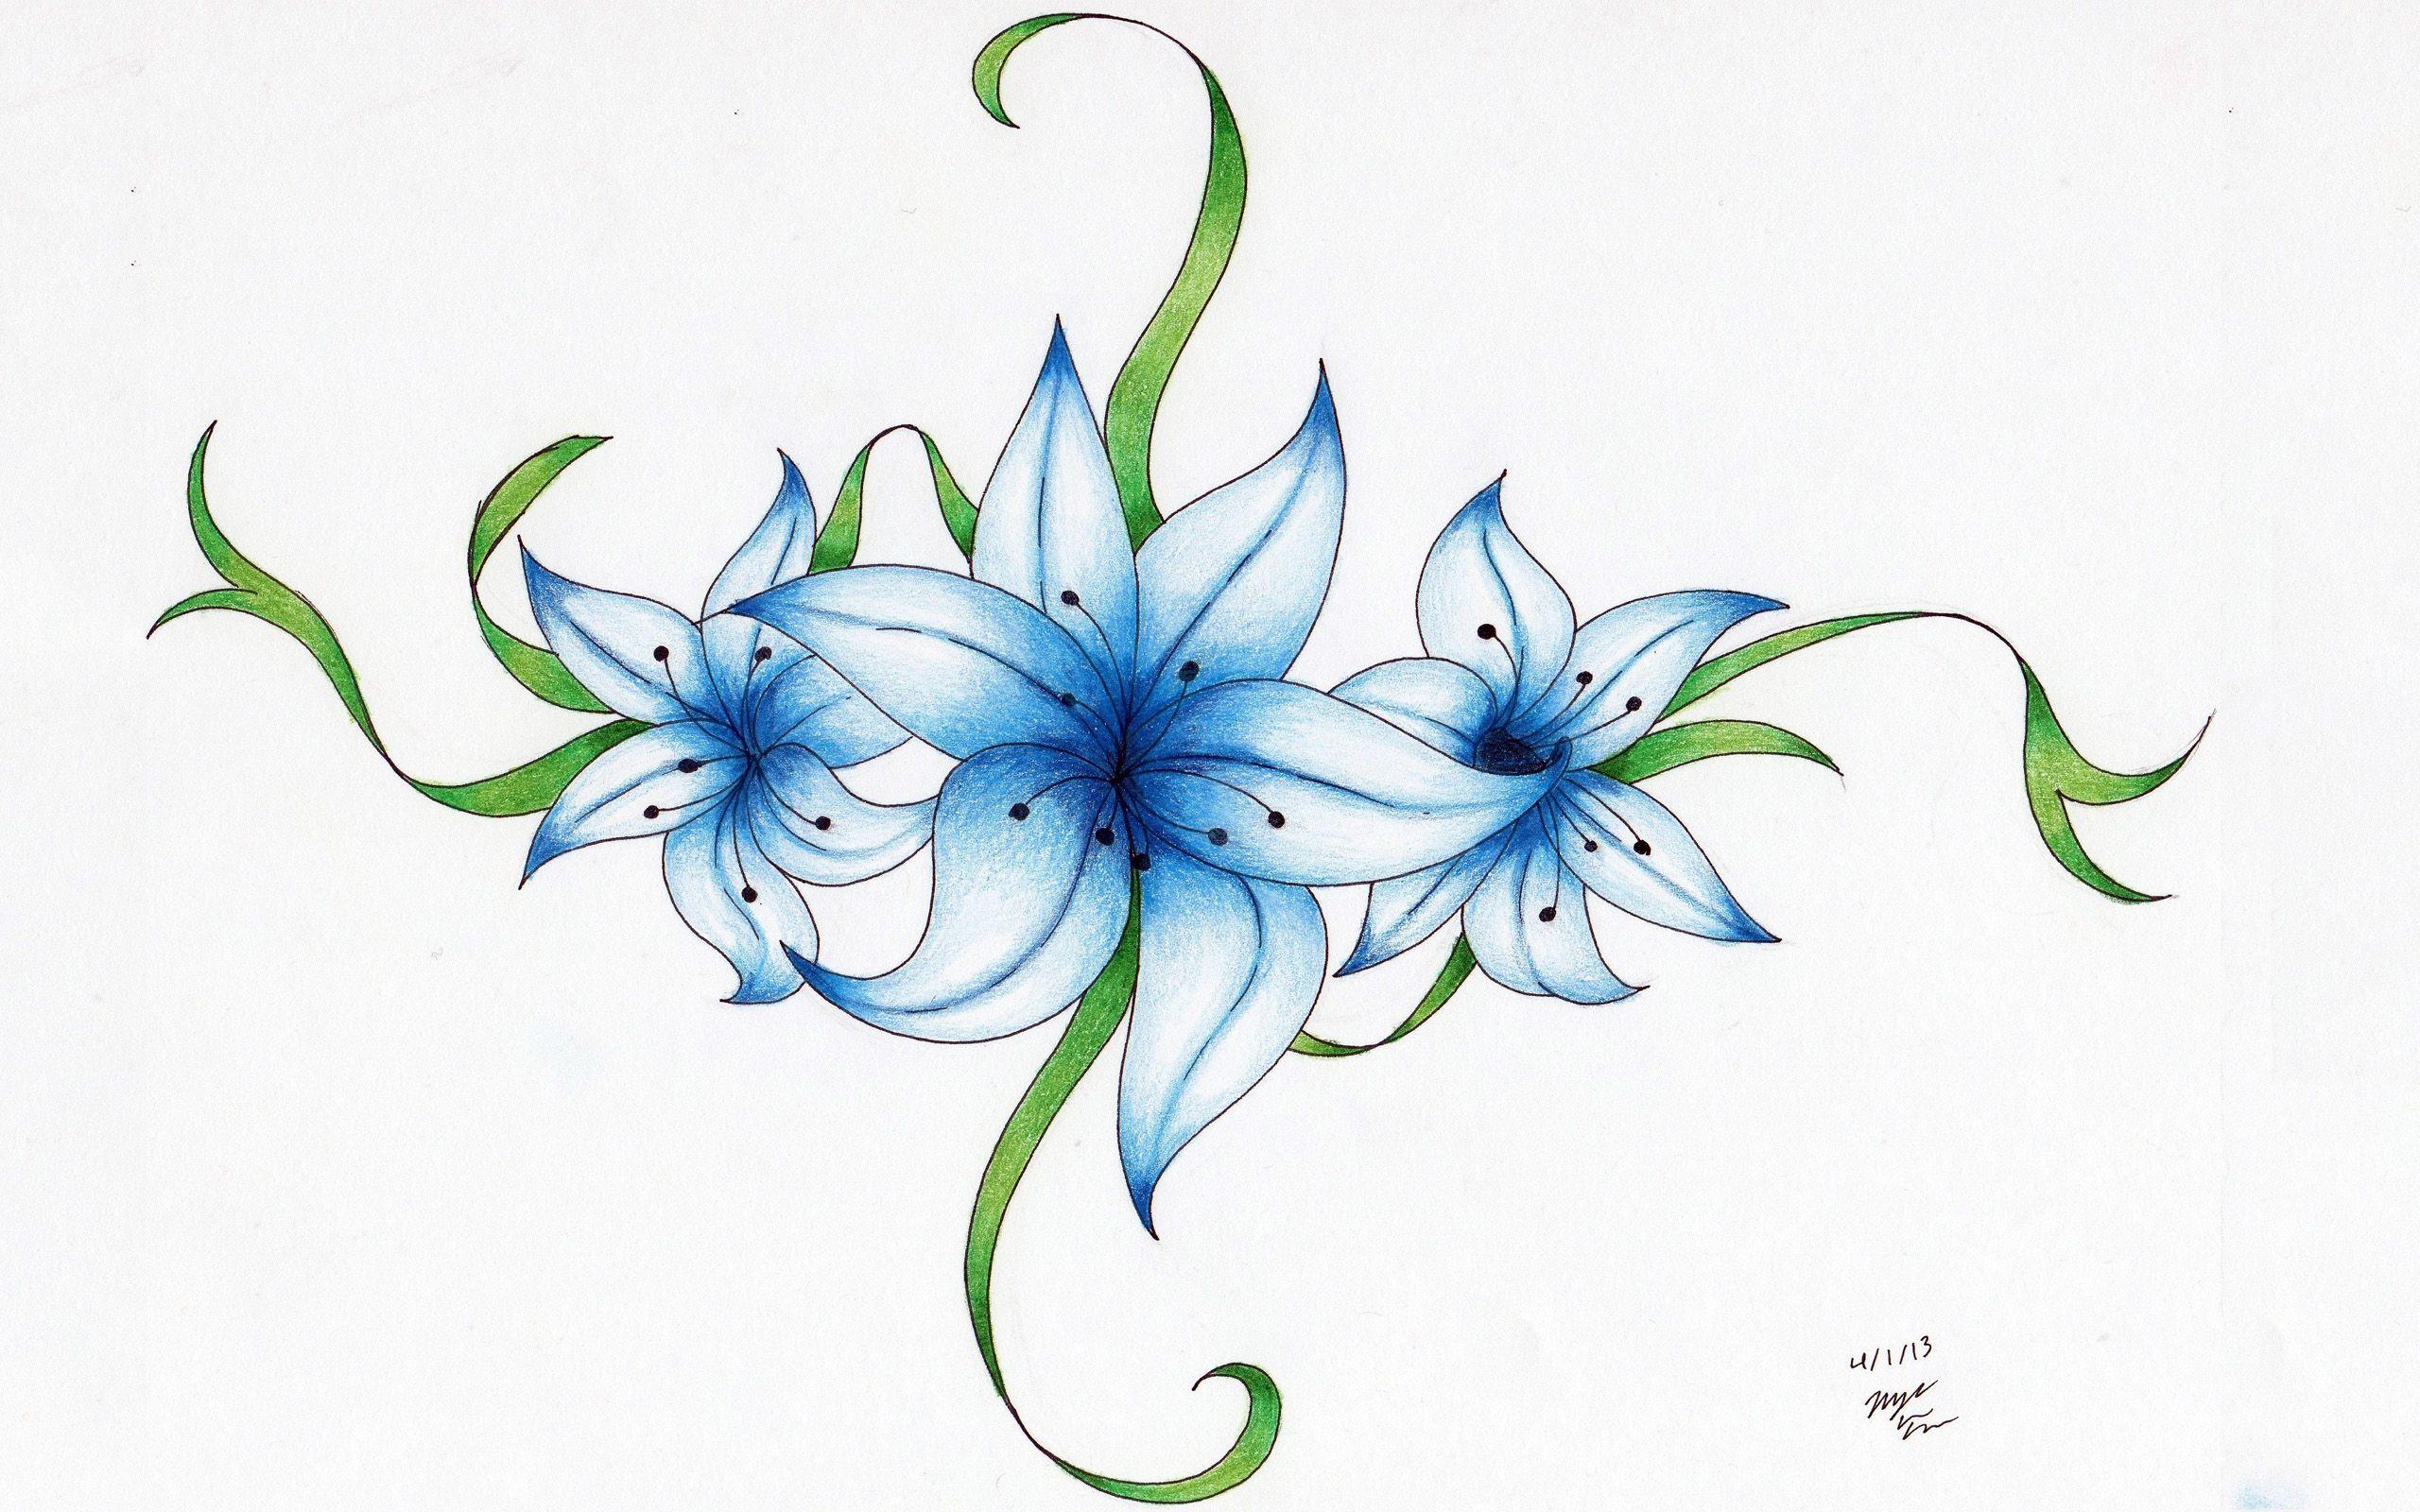 Tattoos Of Cosmos Flowers Colorful Flower Tattoo Flower Tattoo Designs Tattoos